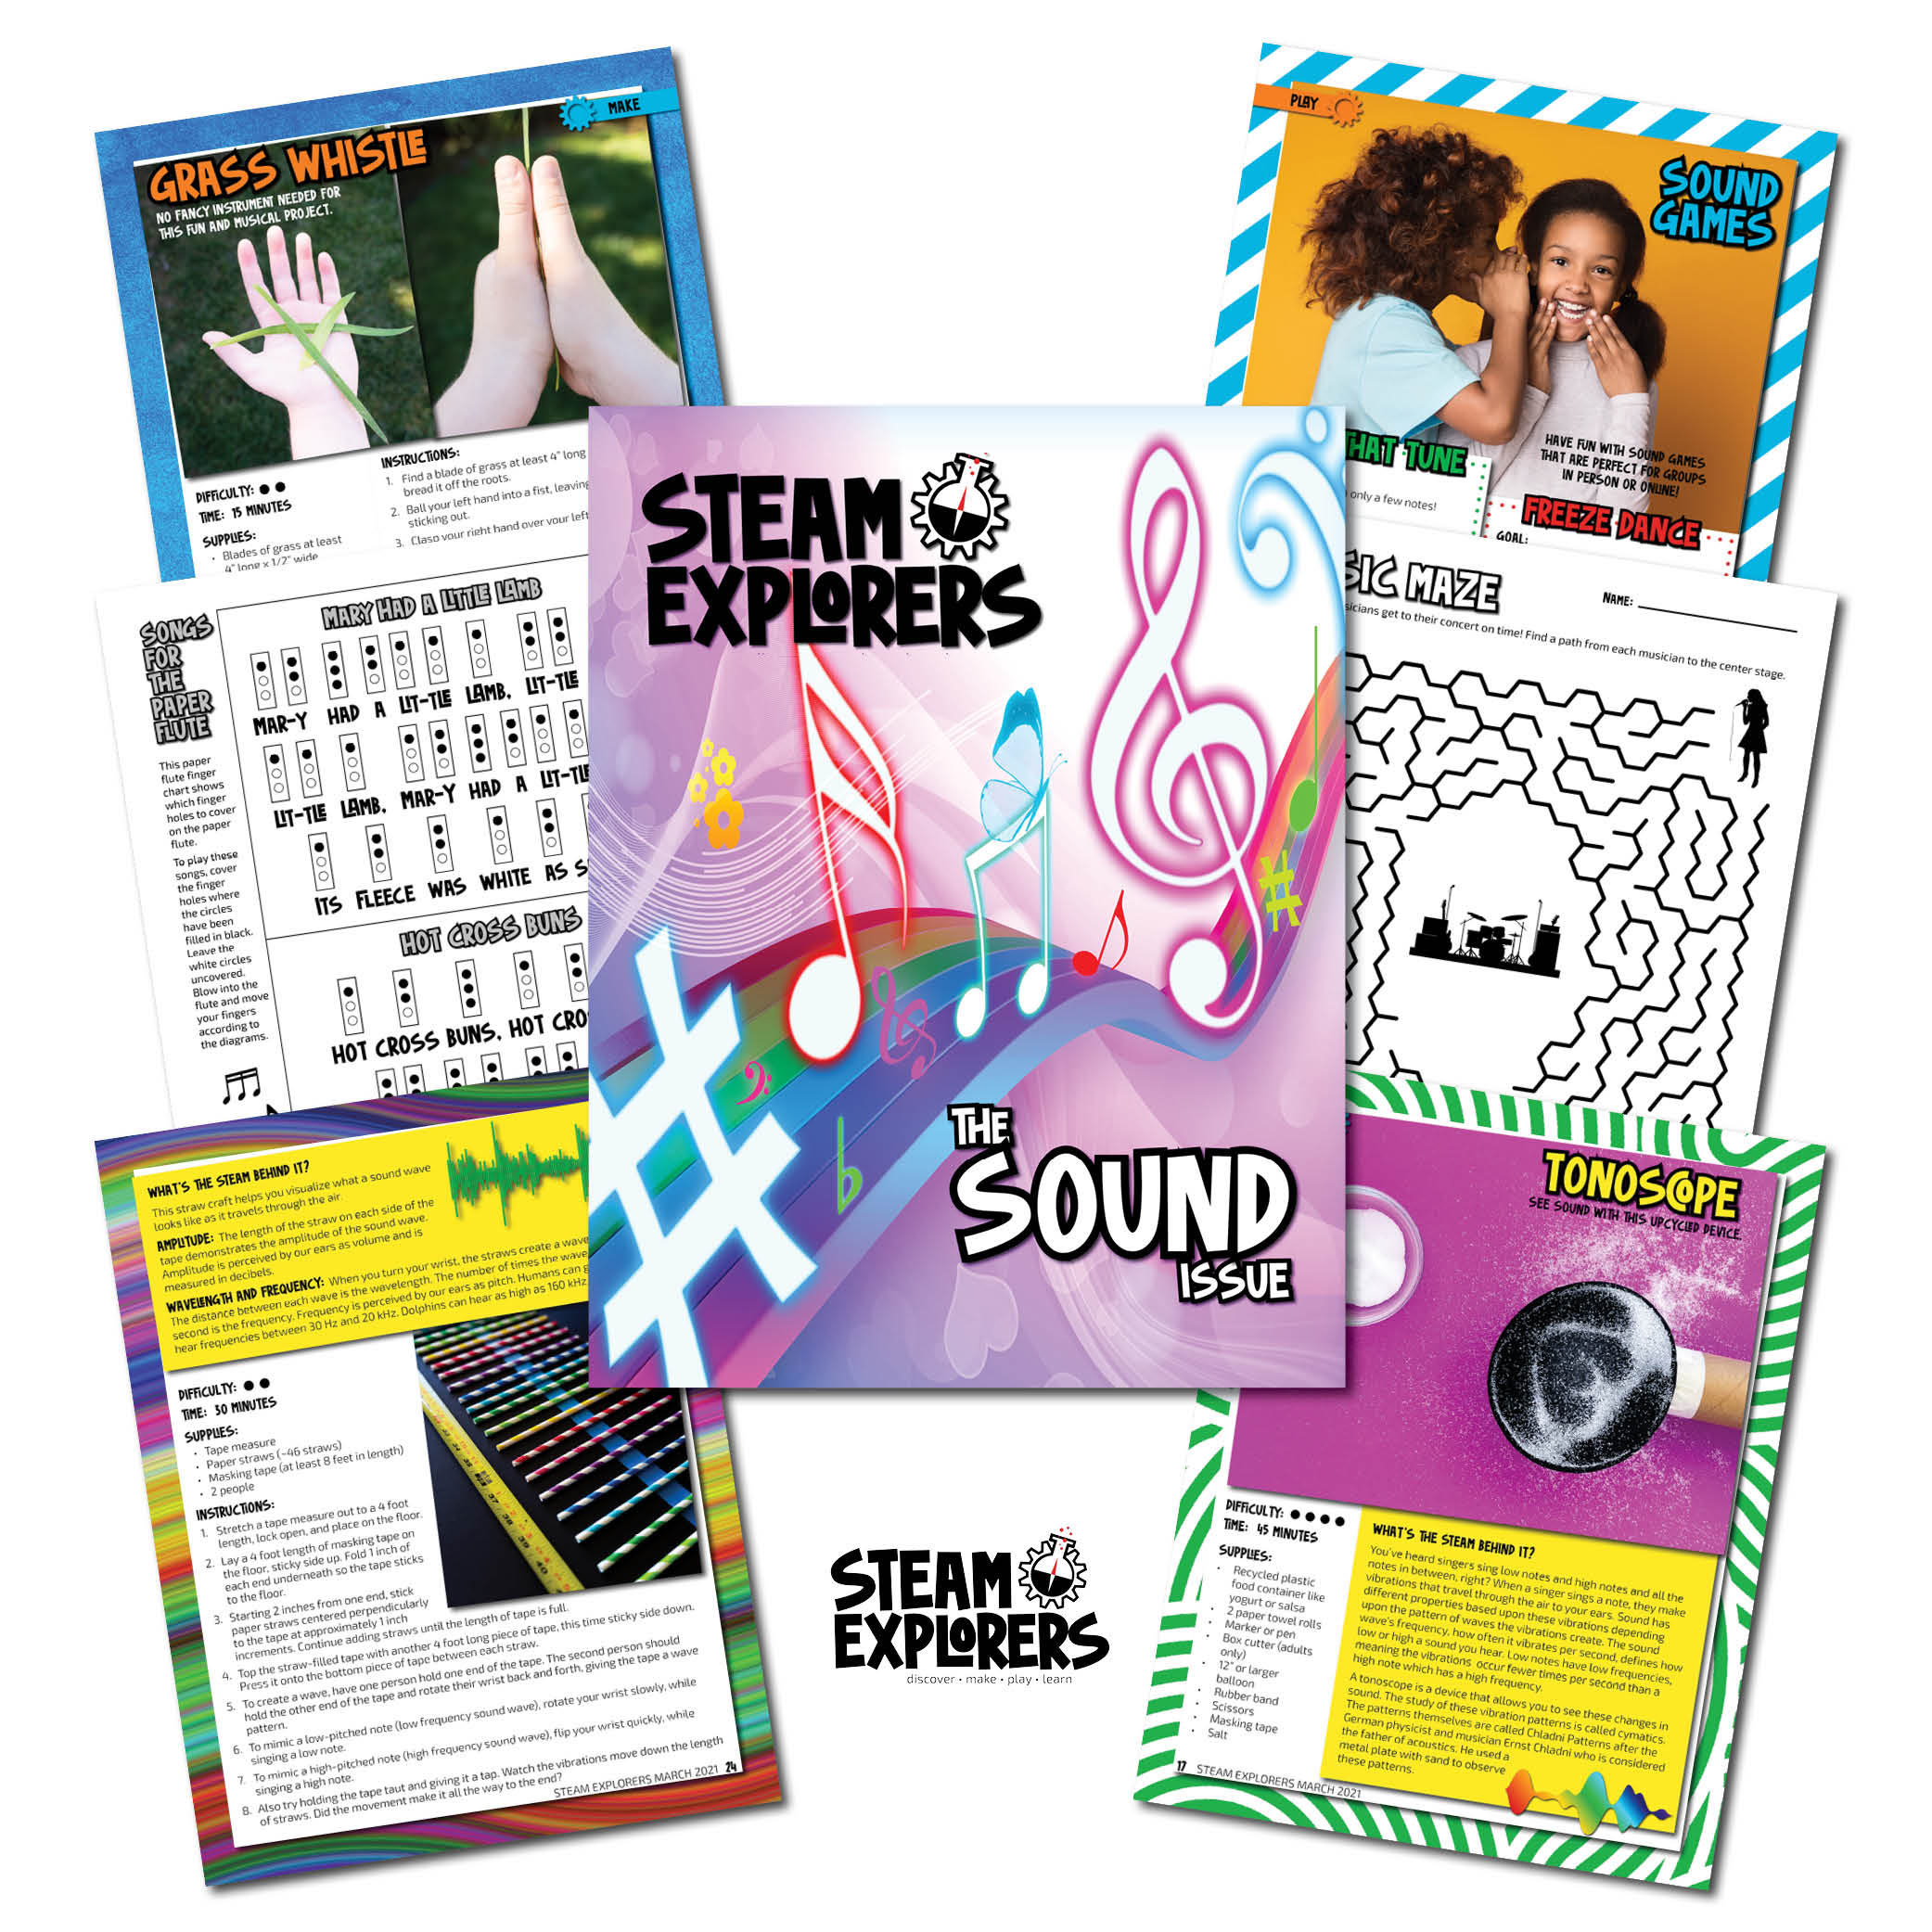 Sound Issue - What's Inside v2